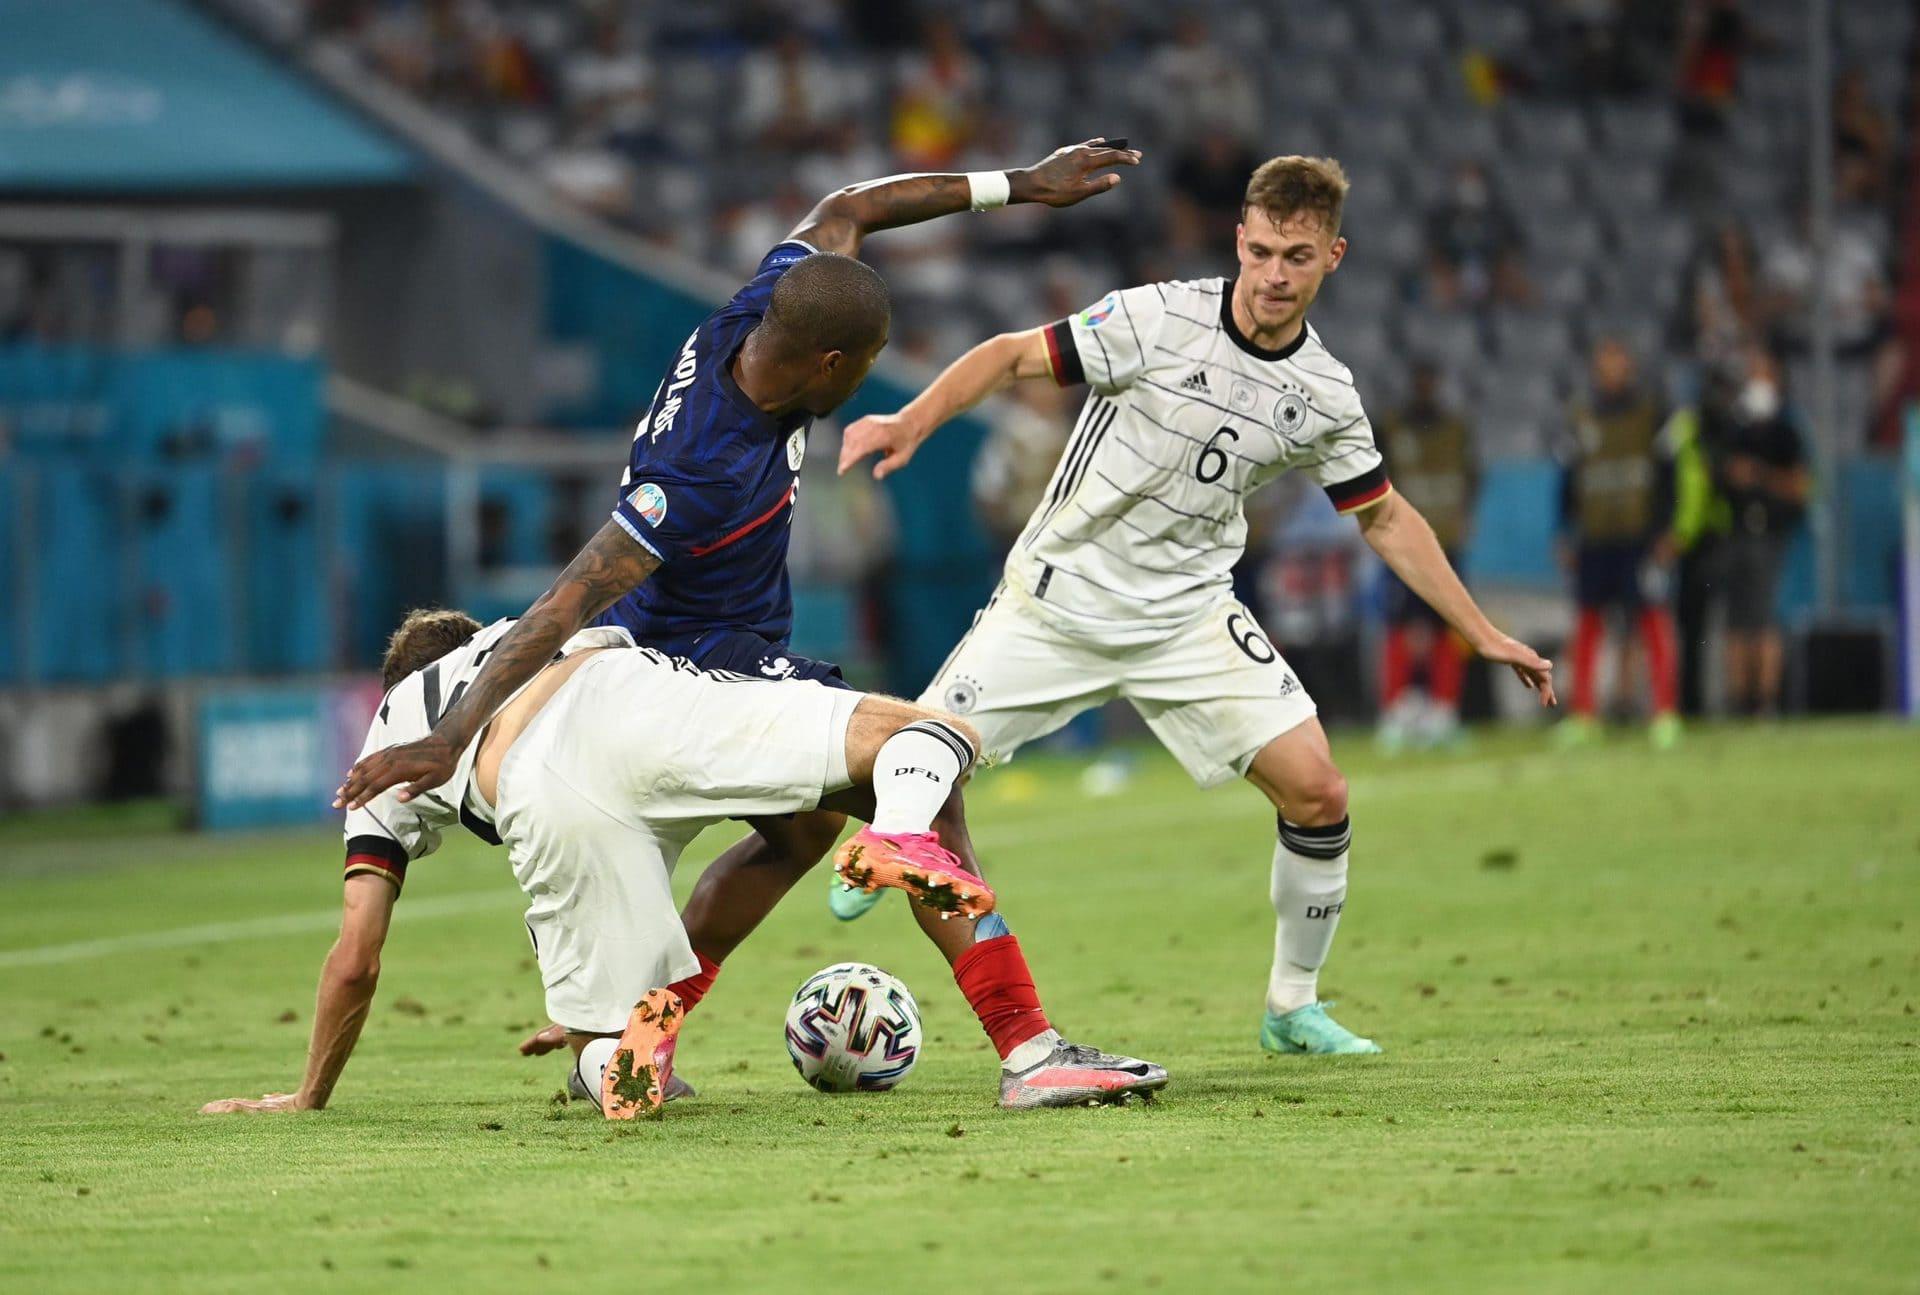 Leidenschaft reicht nicht: Fehlstart nach Hummels-Eigentor Fußball-EM